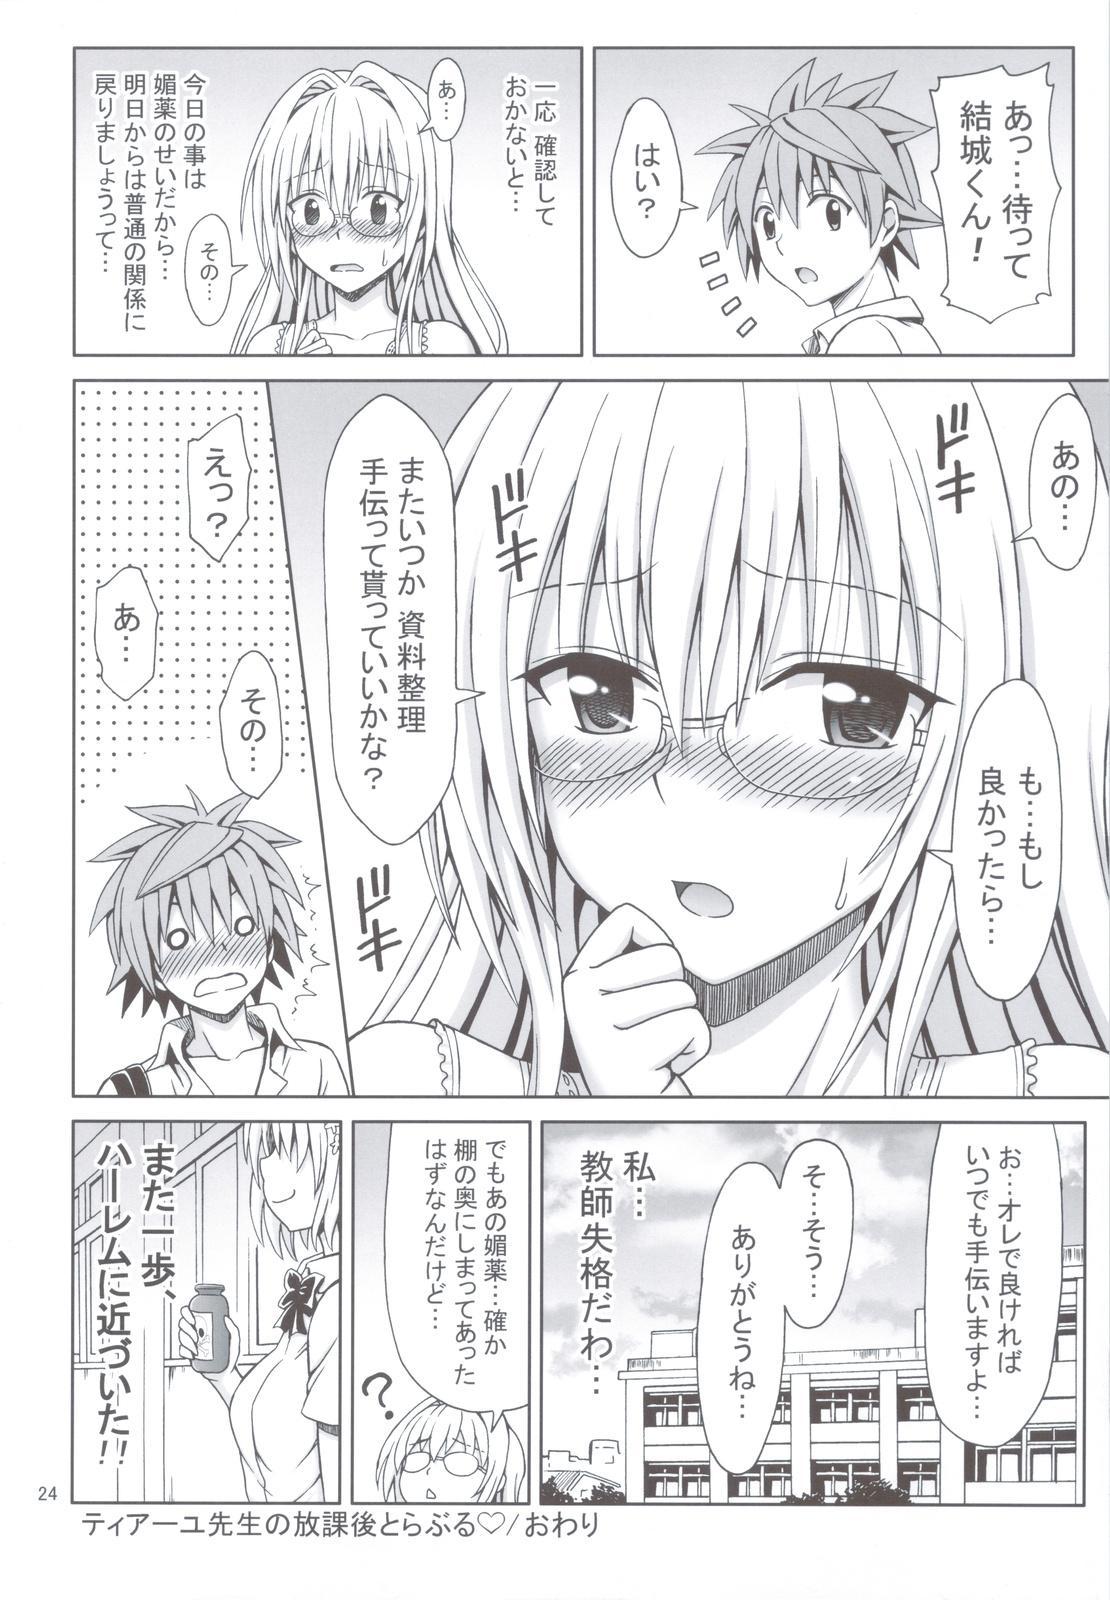 Tearju Sensei no Houkago Trouble 22